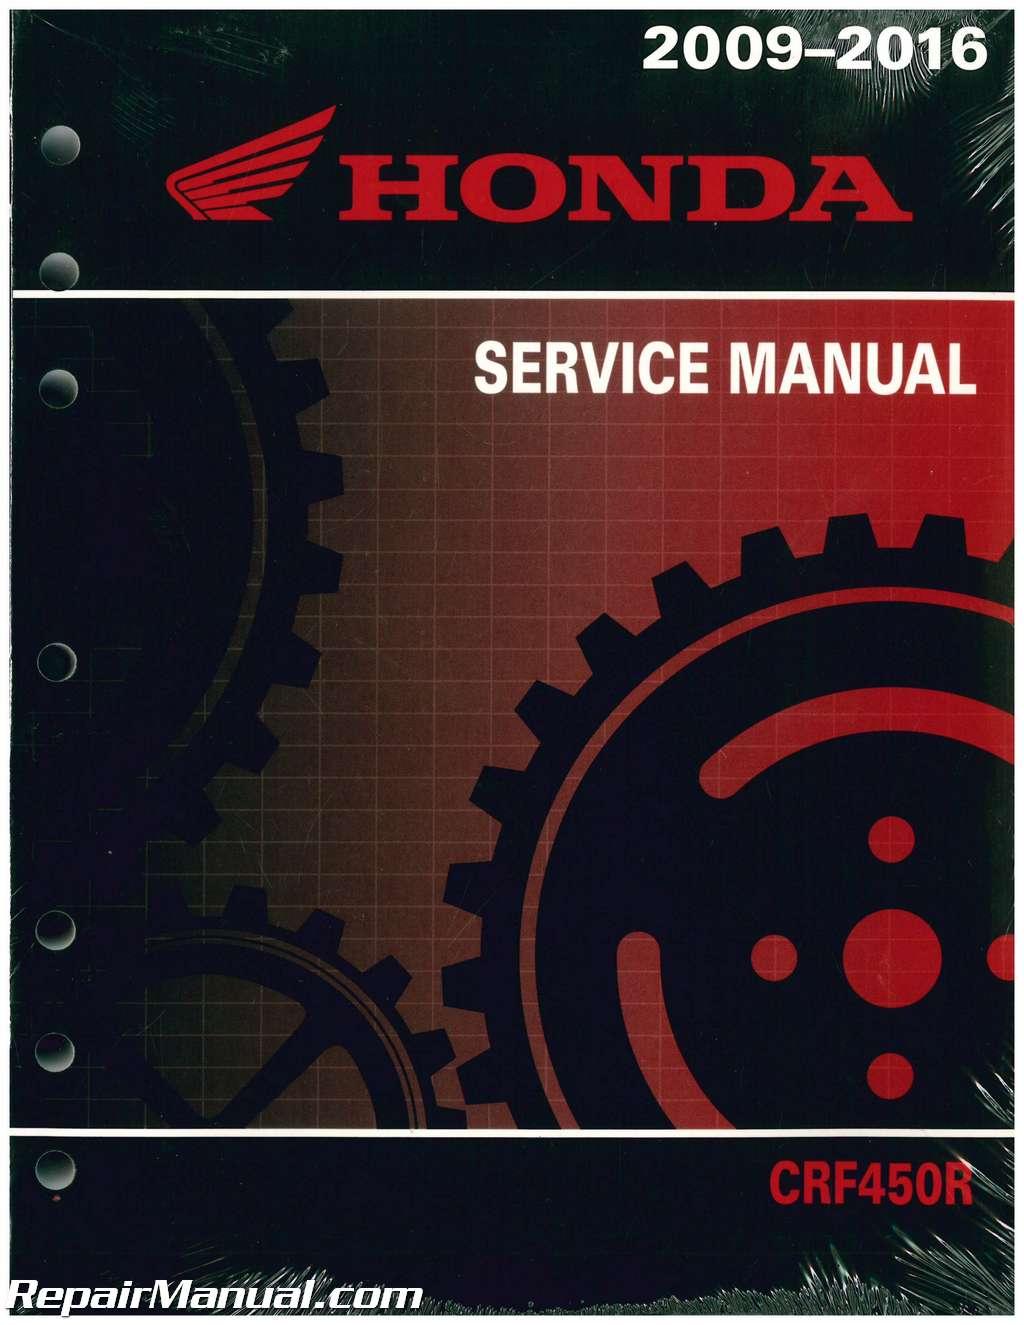 hight resolution of 2009 2016 honda crf450r motorcycle service manual2009 2016 honda crf450r